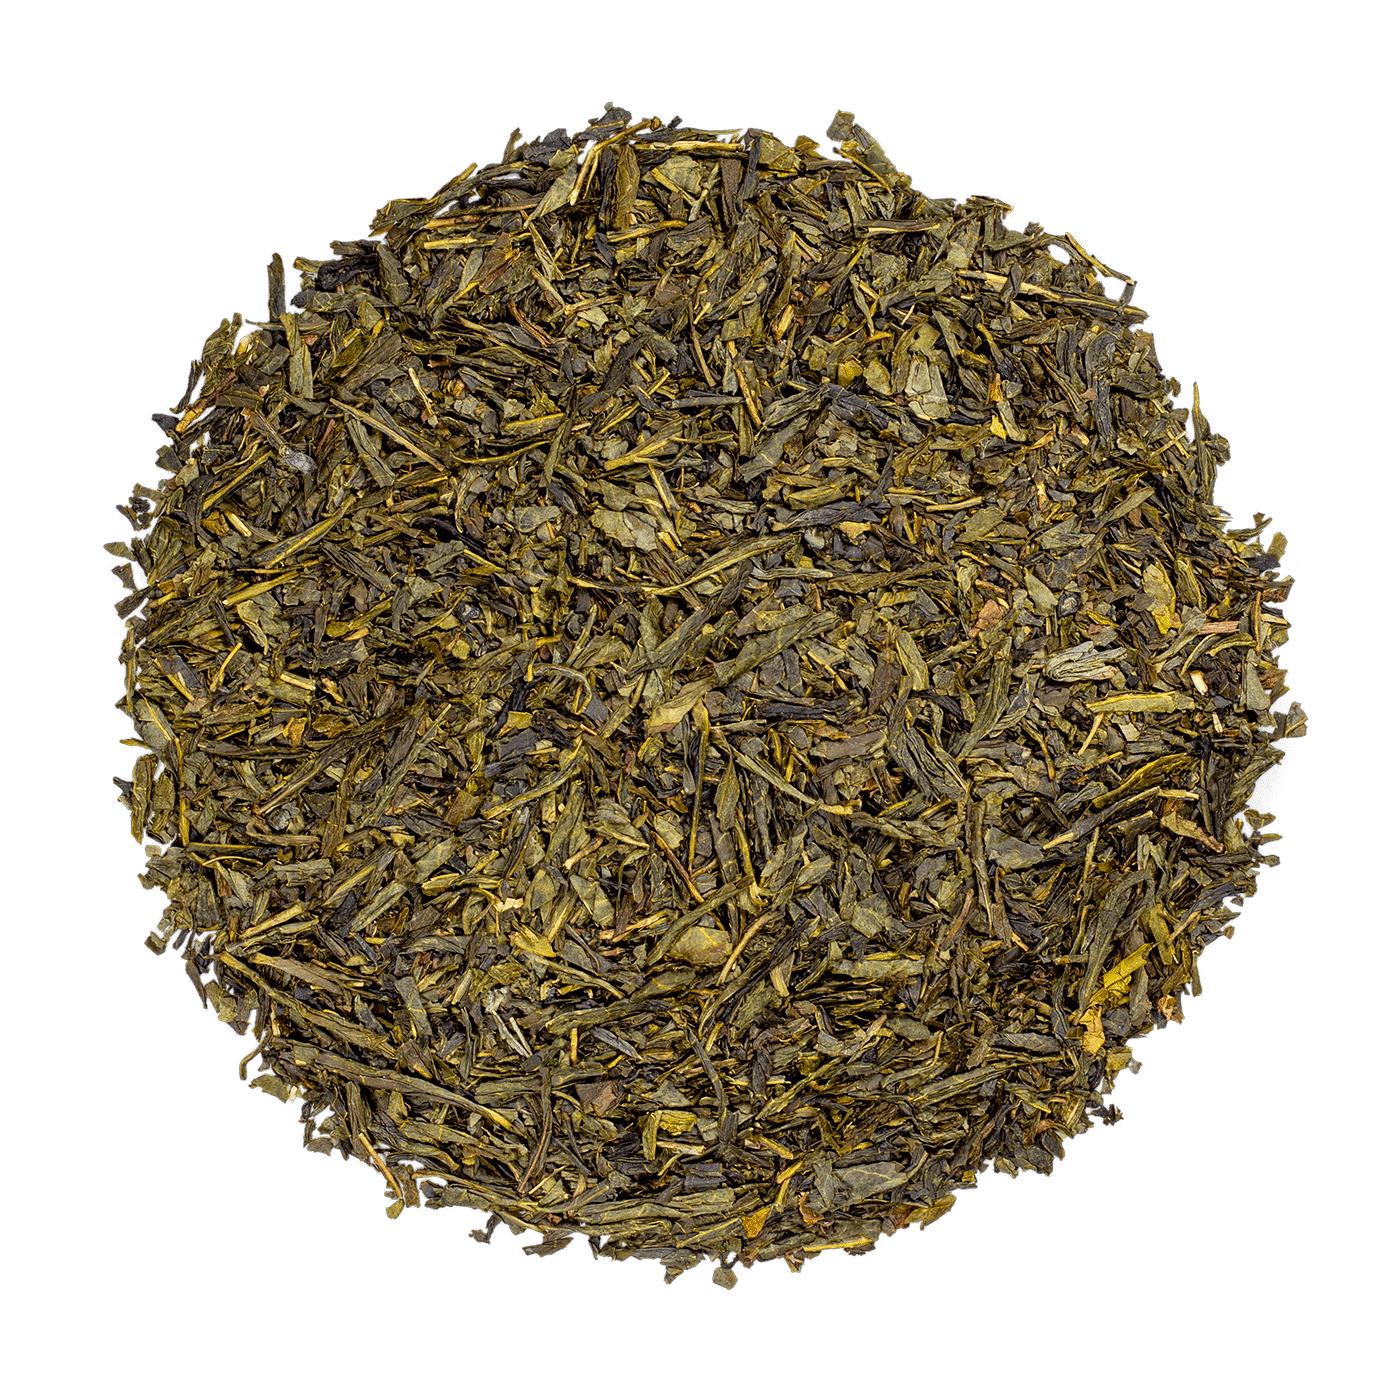 KUSMI TEA Vert Fraise Bio - Thé vert à la fraise - Kusmi Tea